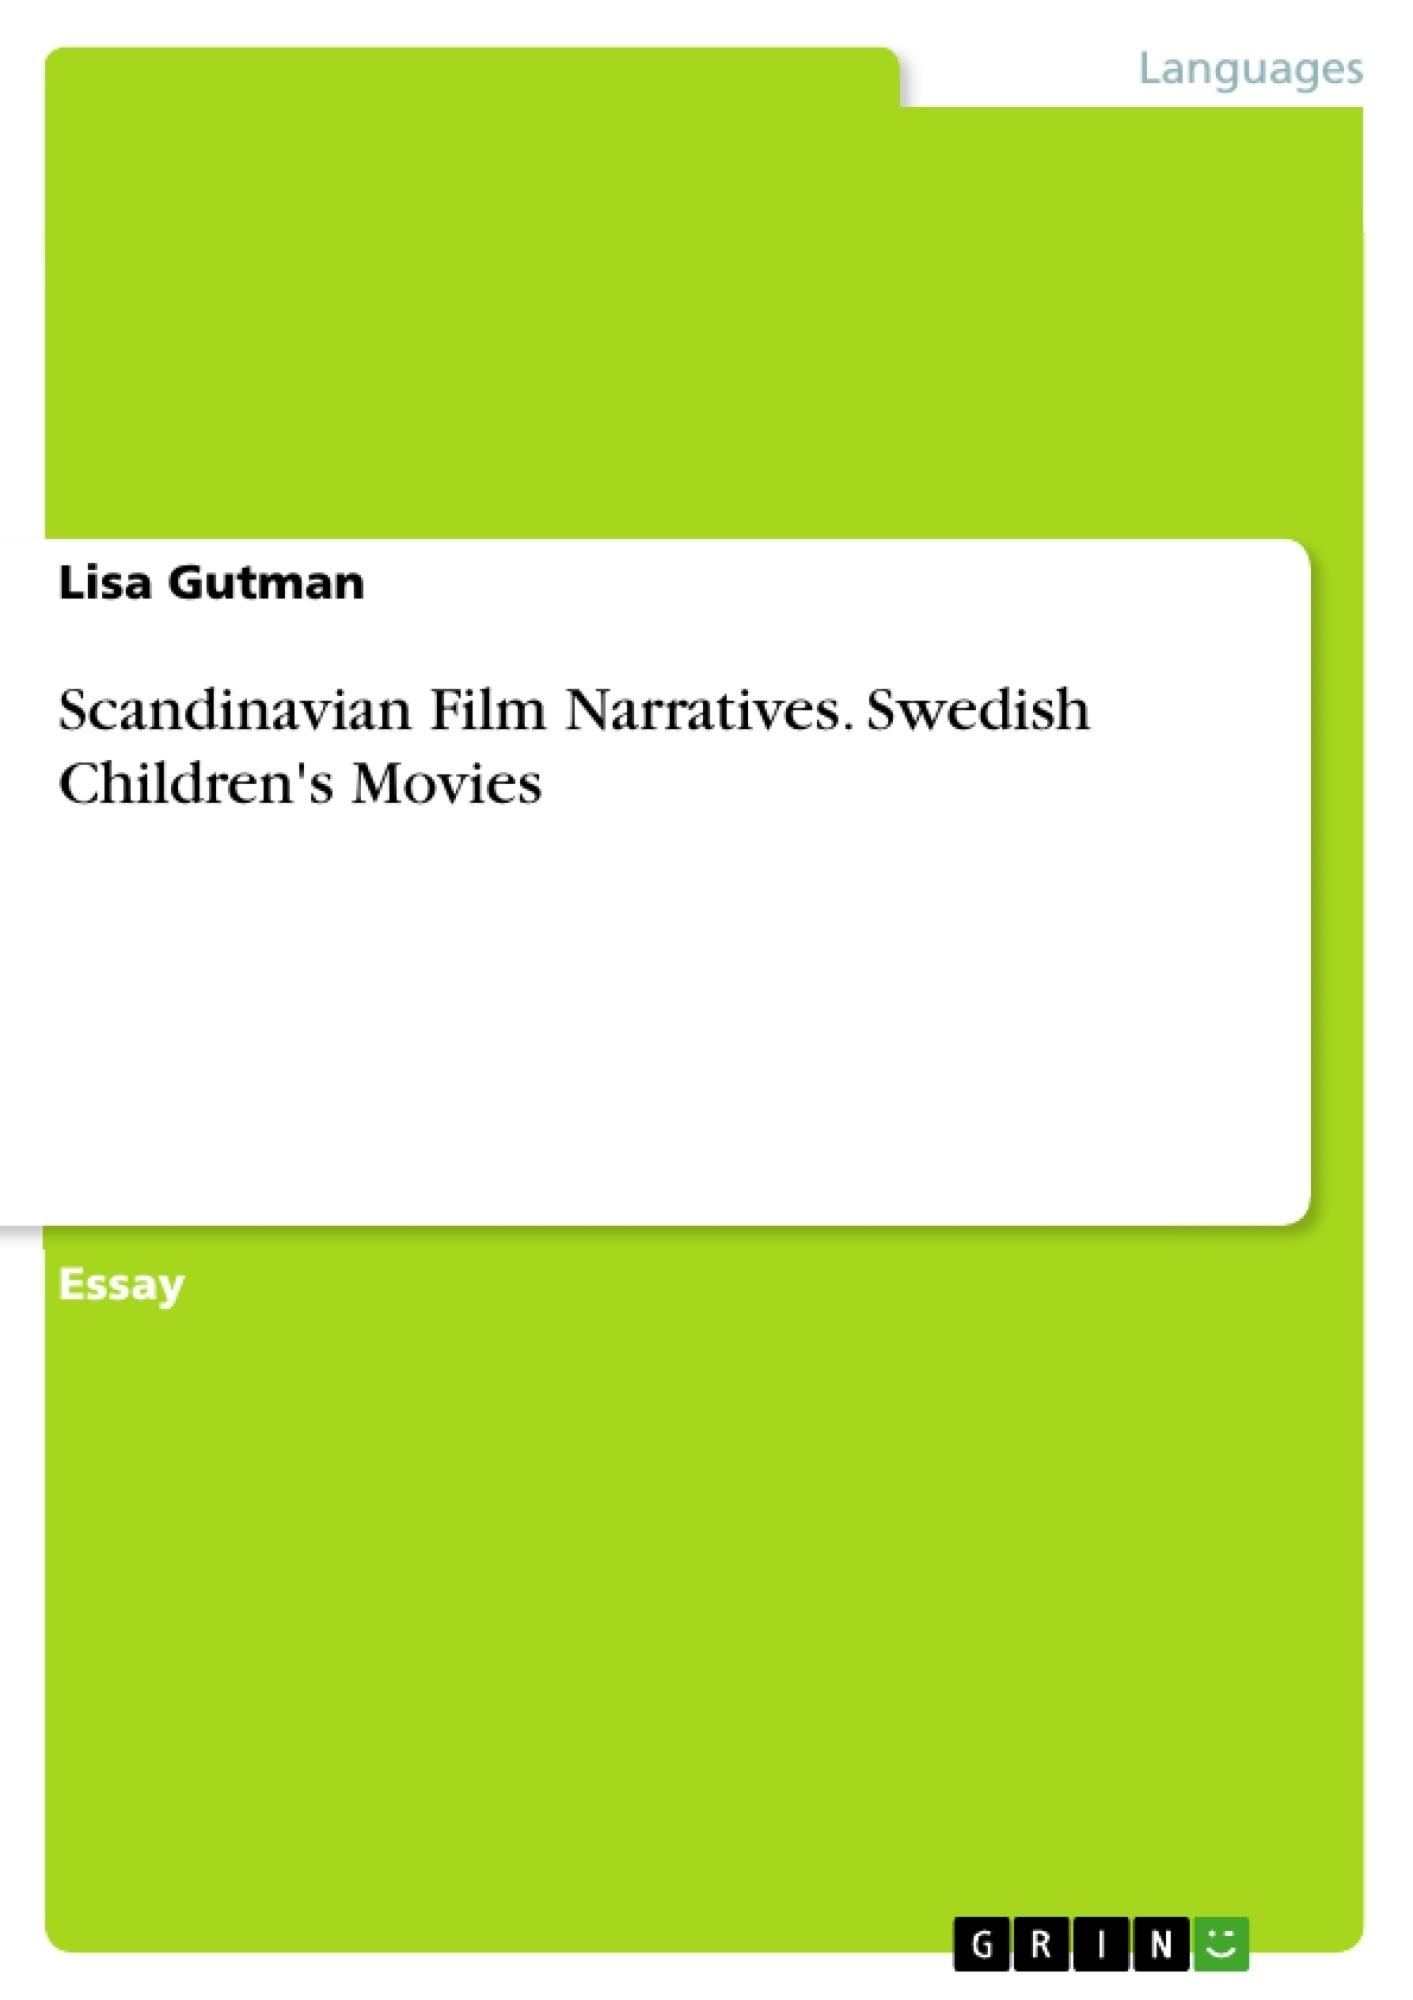 Title: Scandinavian Film Narratives. Swedish Children's Movies